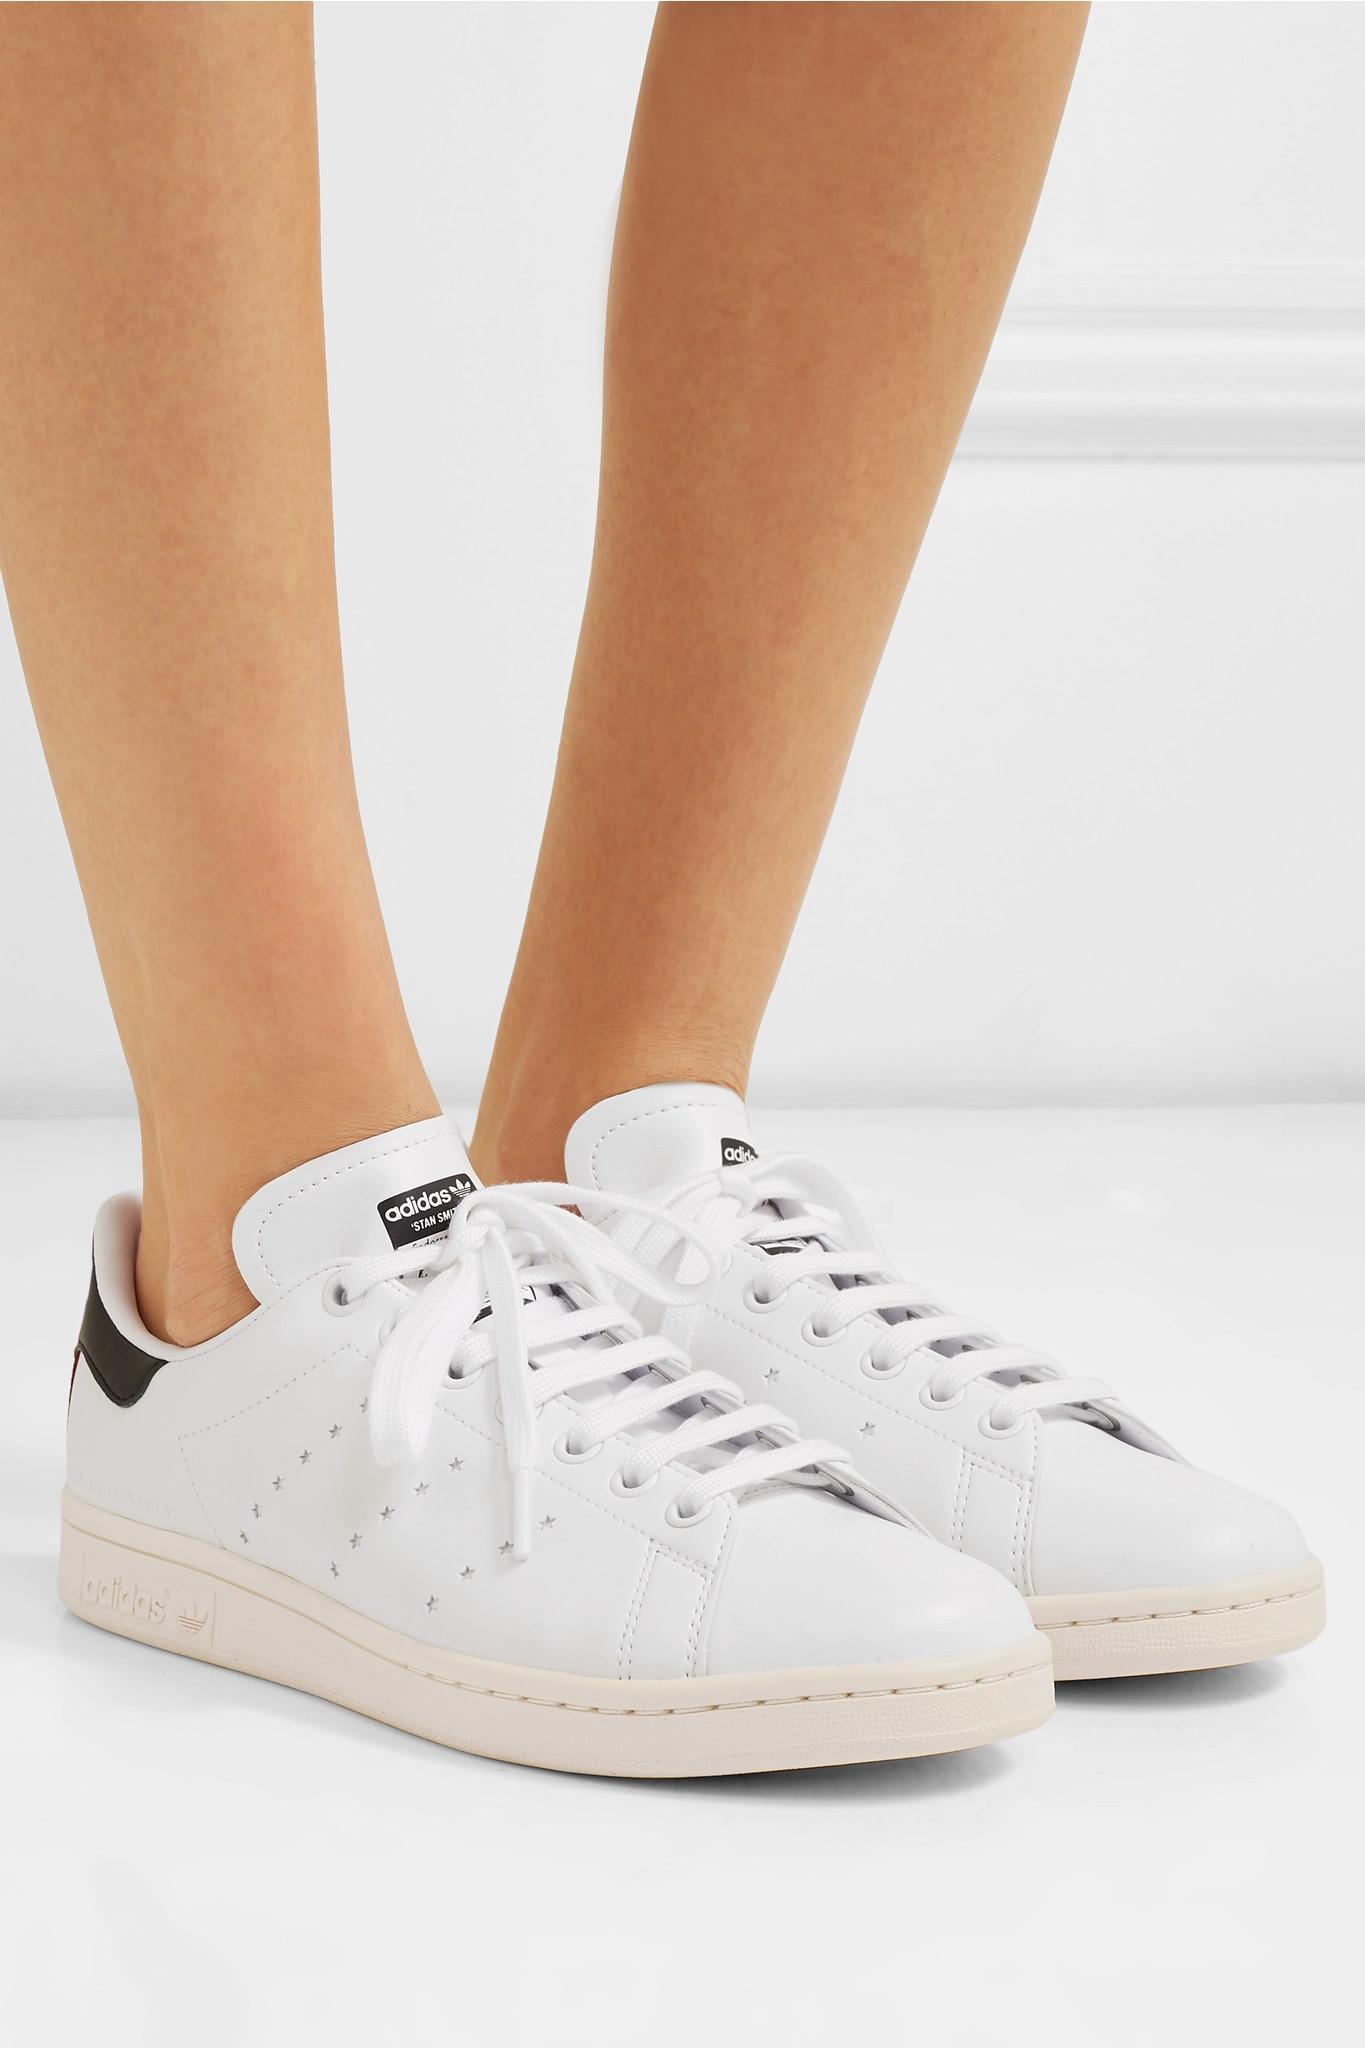 76aa79c8401e Stella McCartney - White + Adidas Originals Stan Smith Grosgrain-trimmed Faux  Leather Sneakers -. View fullscreen